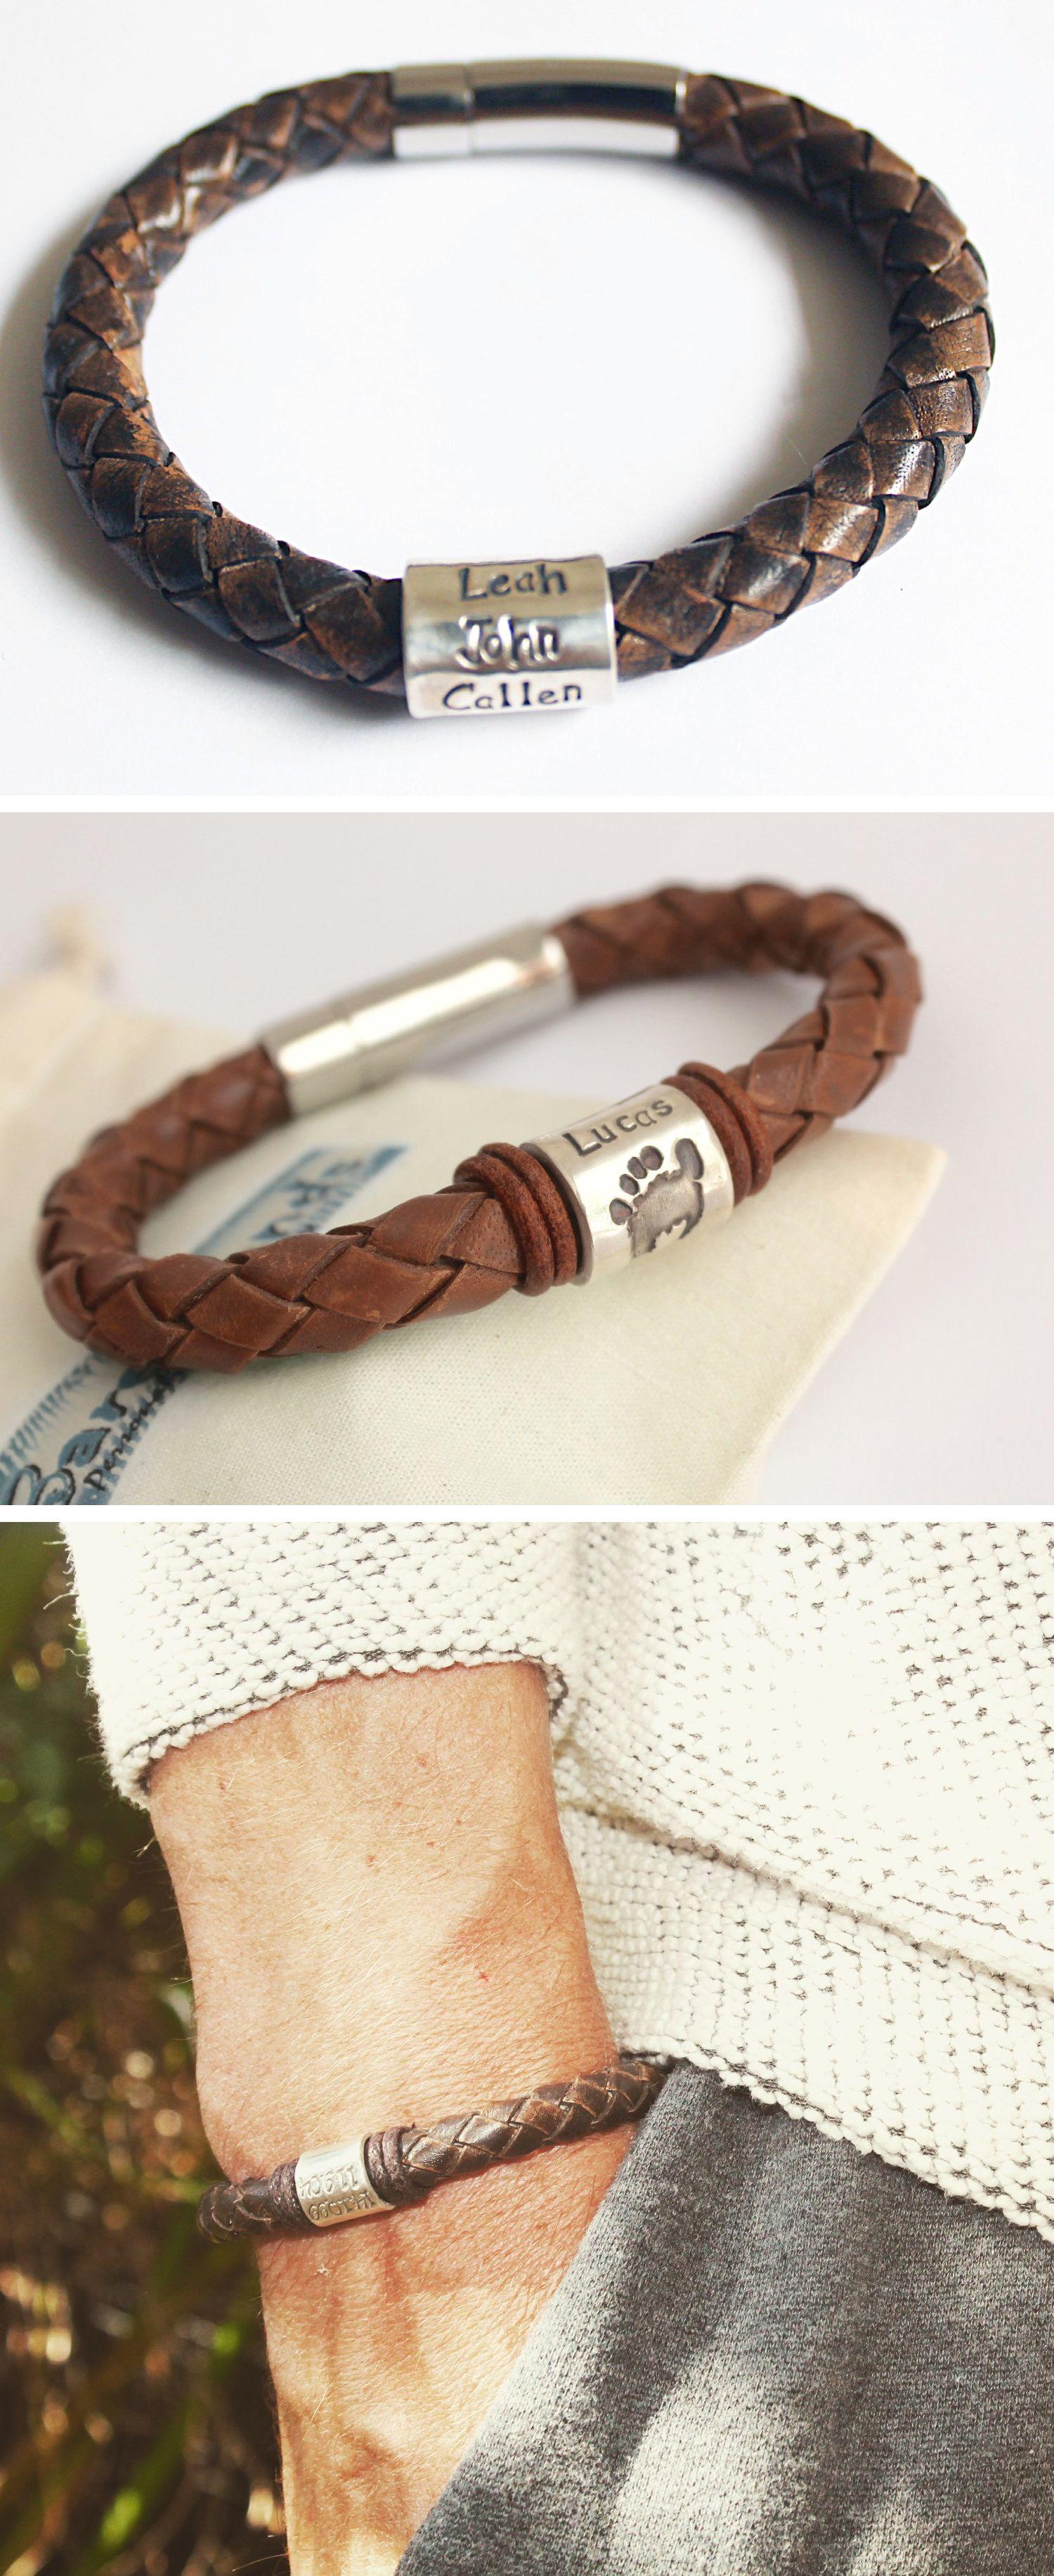 5946bd8ab861b Mens Personalised Bracelet, Leather Name Bracelet, Mens Cuff ...